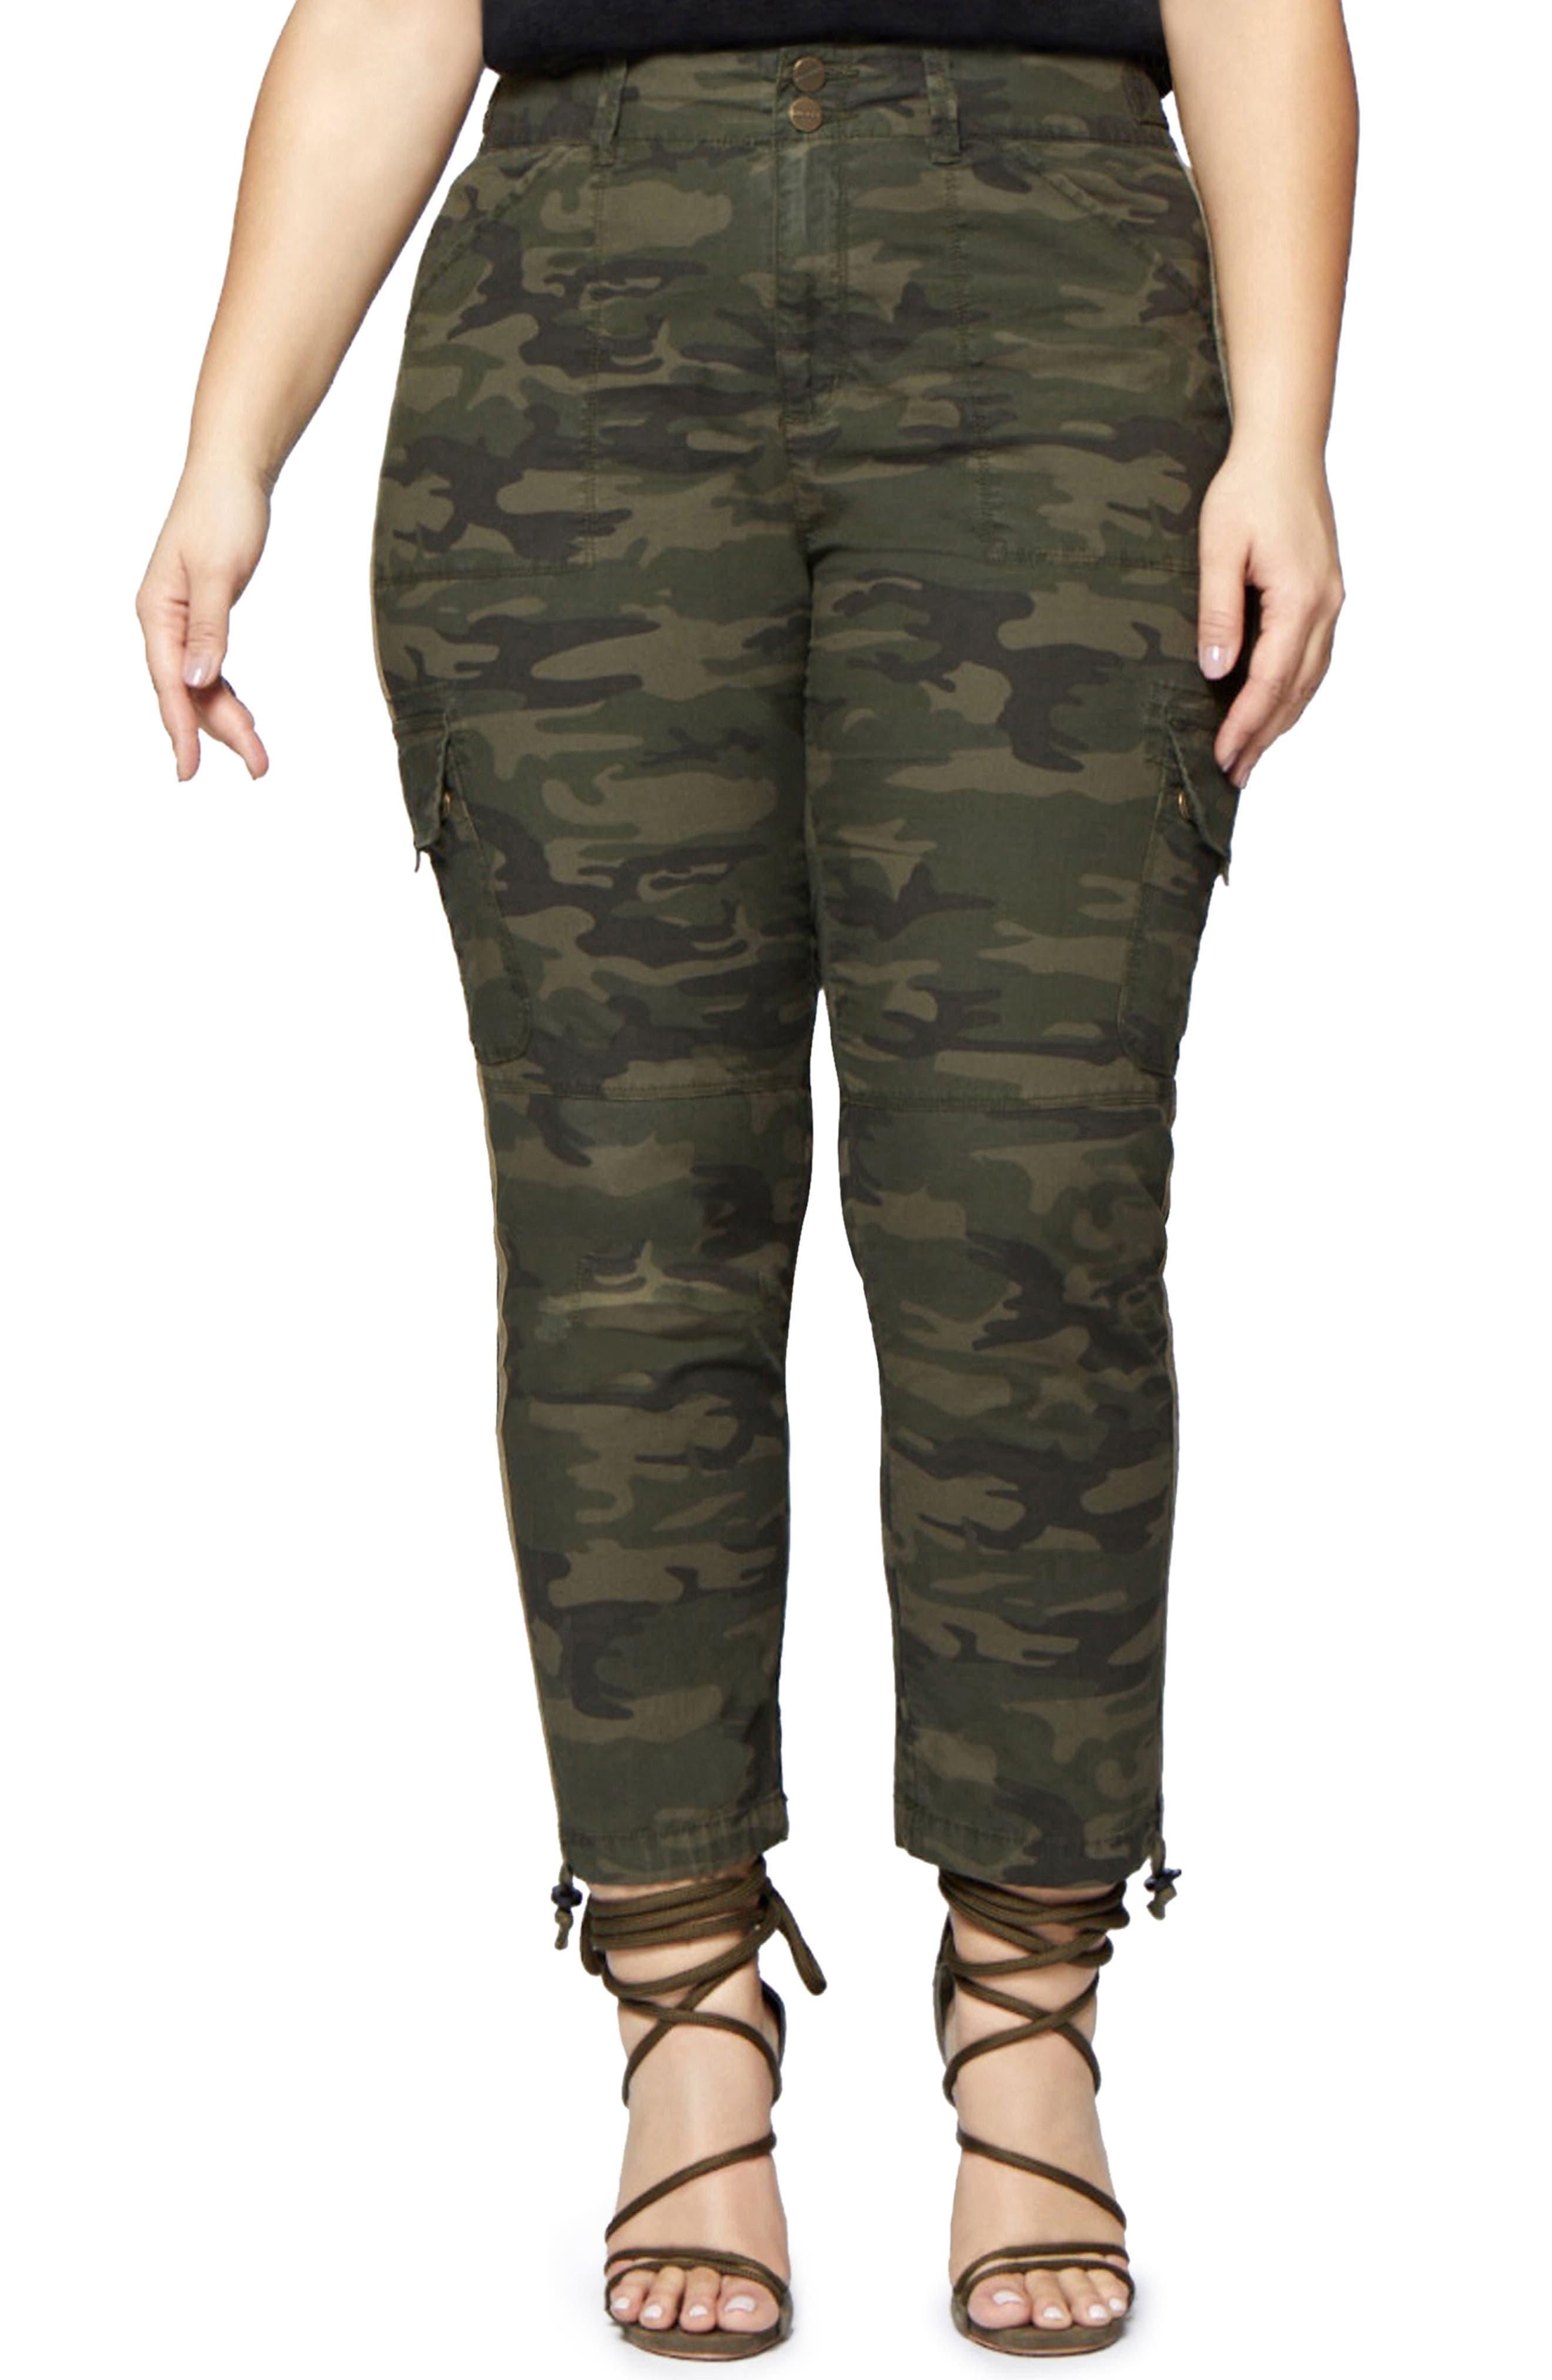 Terrain Camo Crop Cargo Pants,                         Main,                         color, Mother Nature Camo